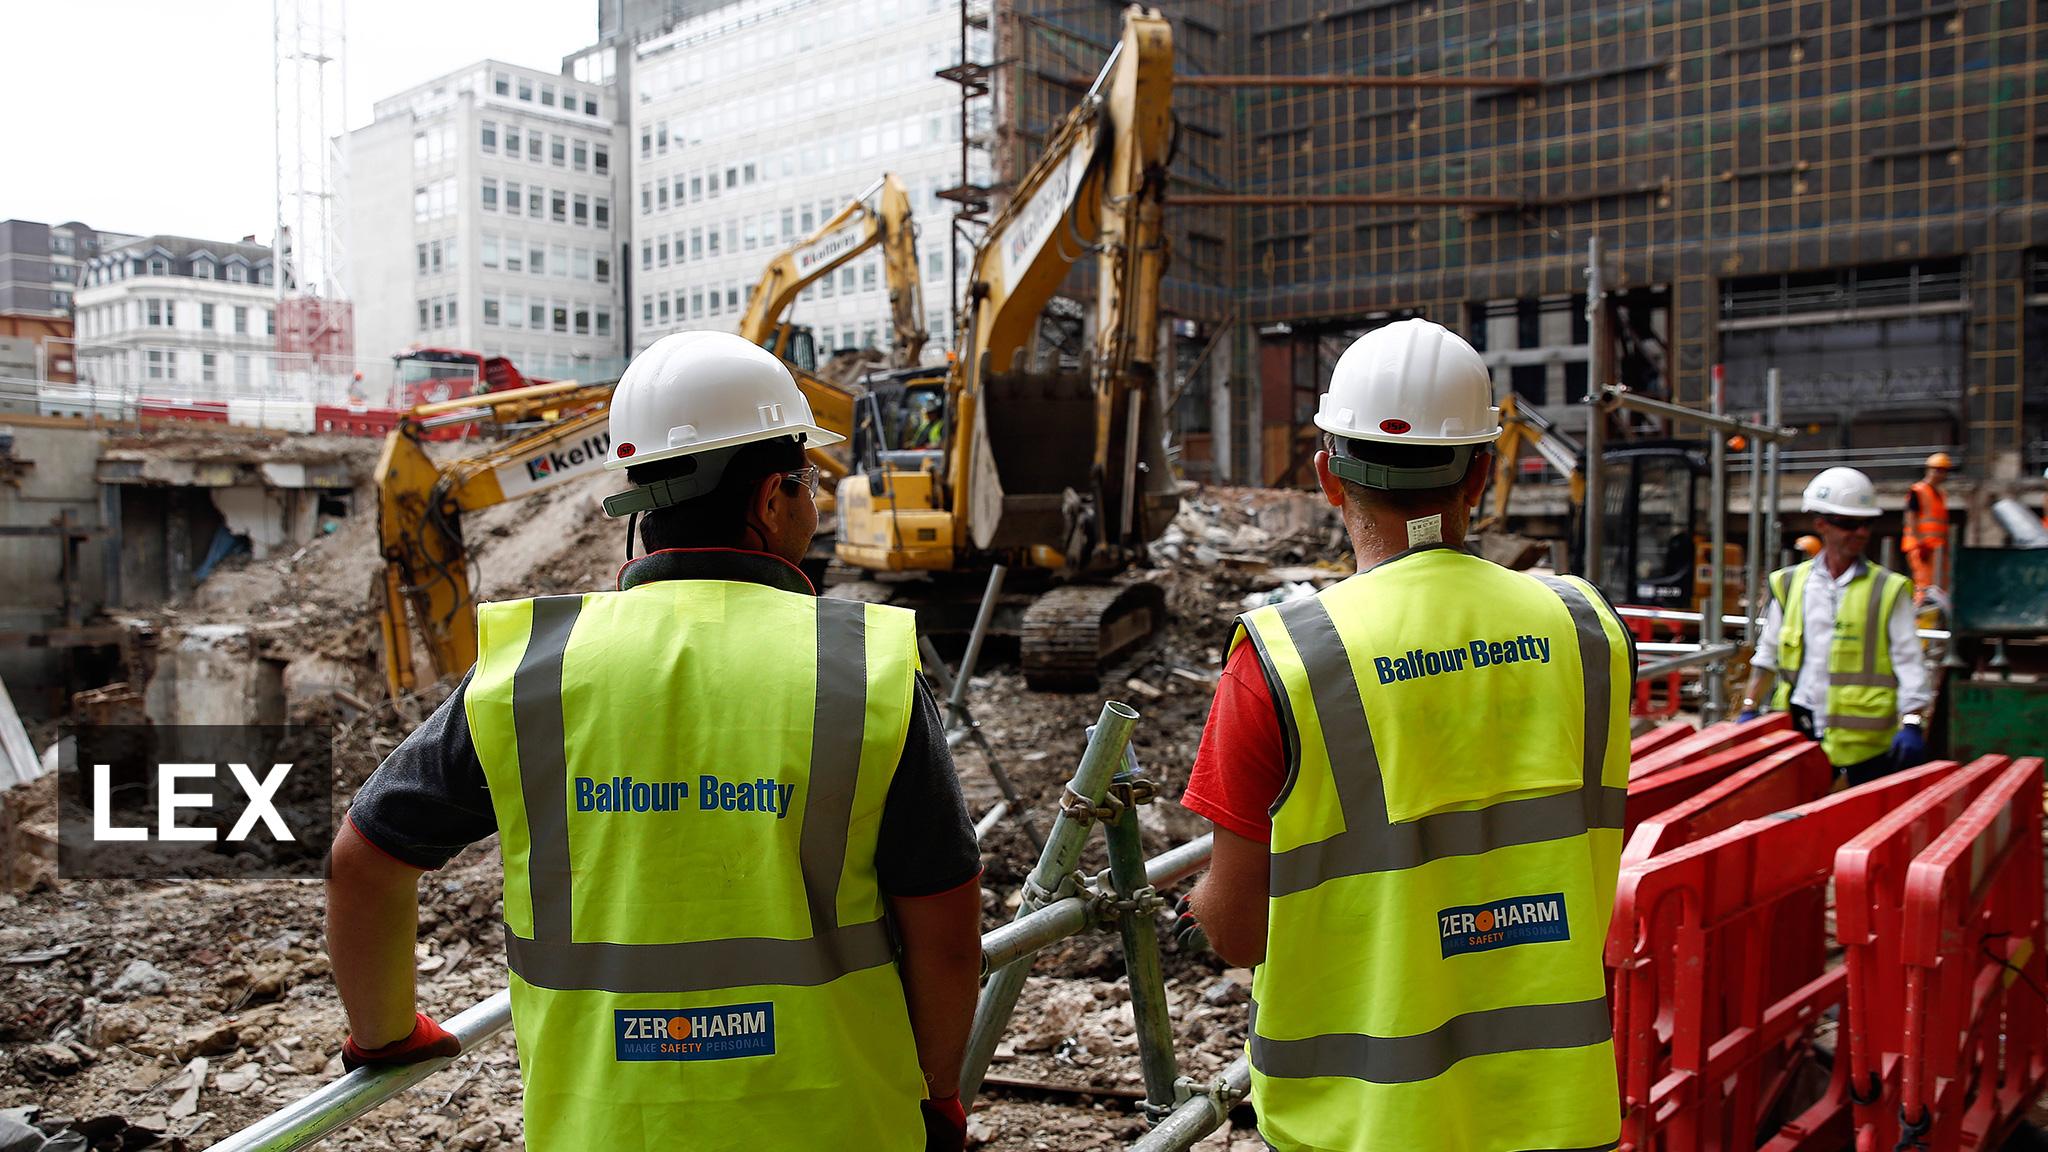 balfour beatty construction a commercial construction